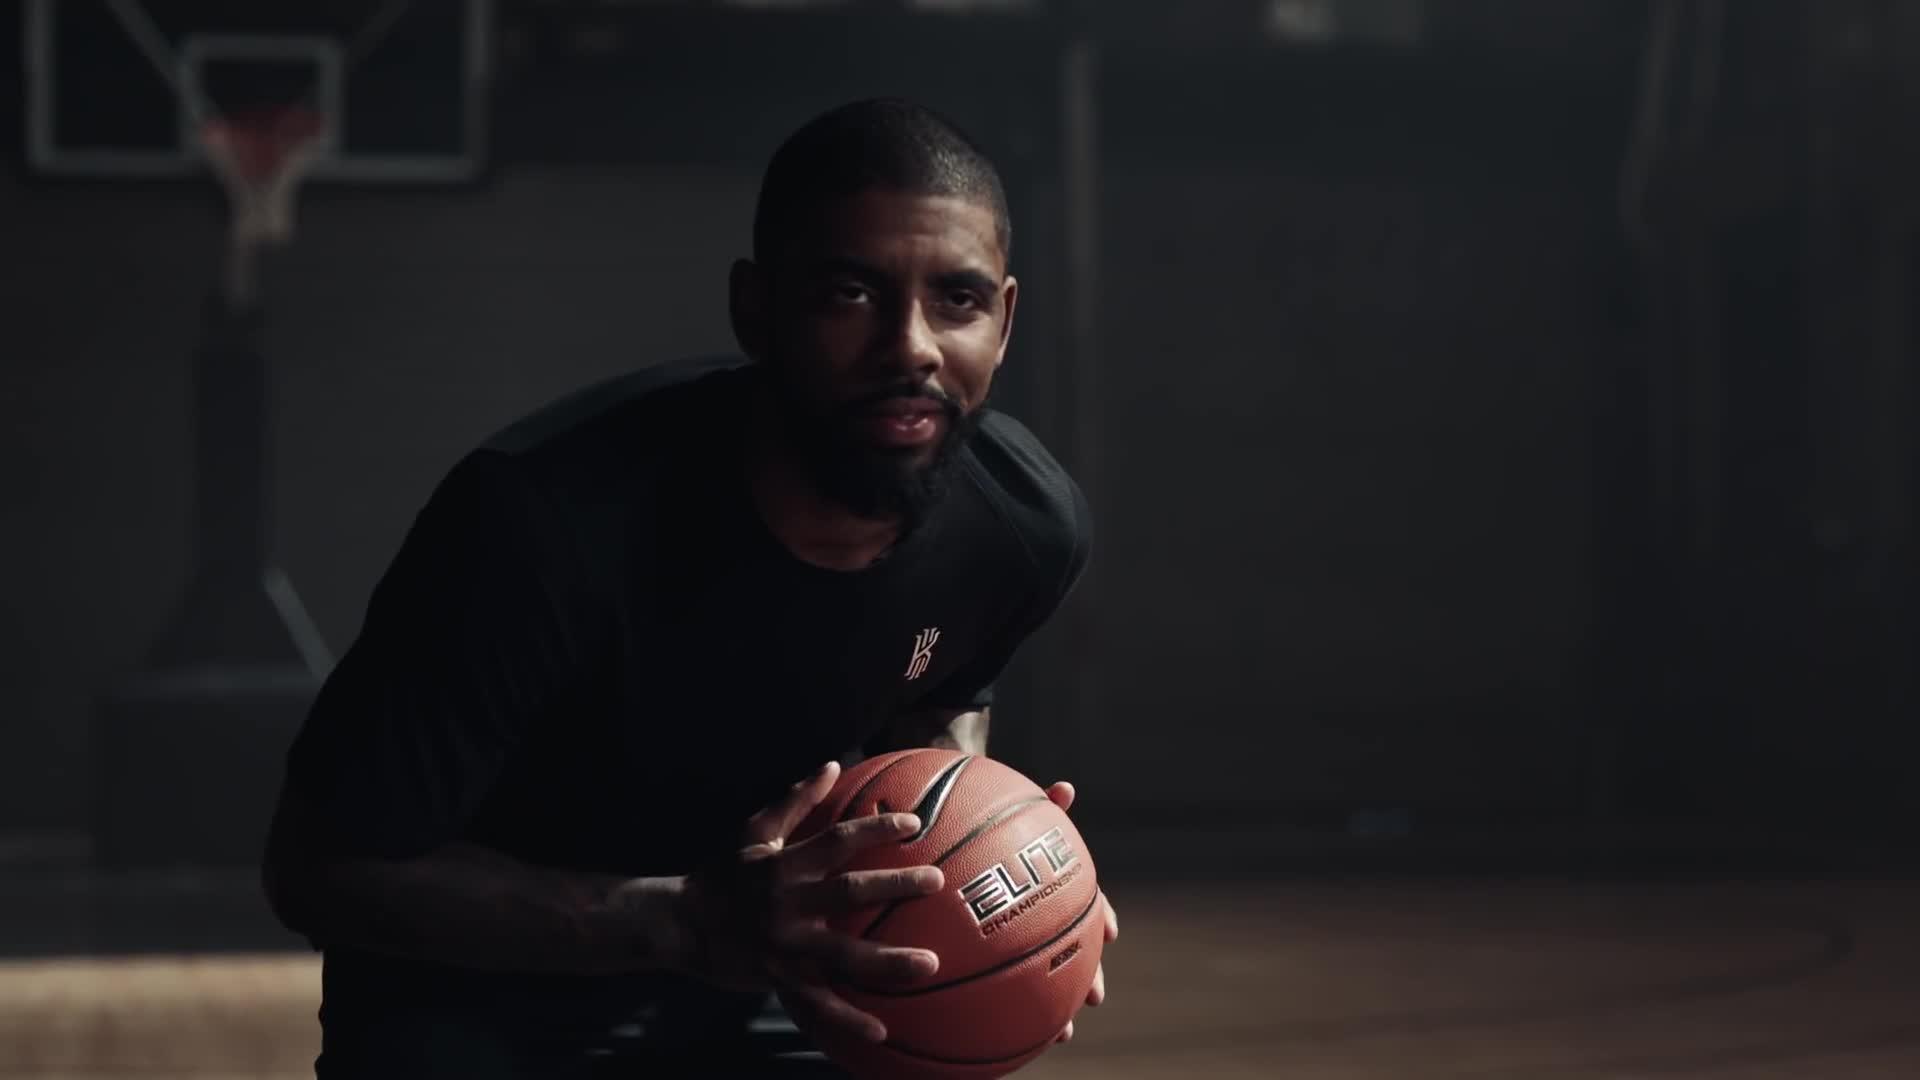 BasketballImprov Culture Nike Culture BasketballImprov Nike Pub QCBdxtshr